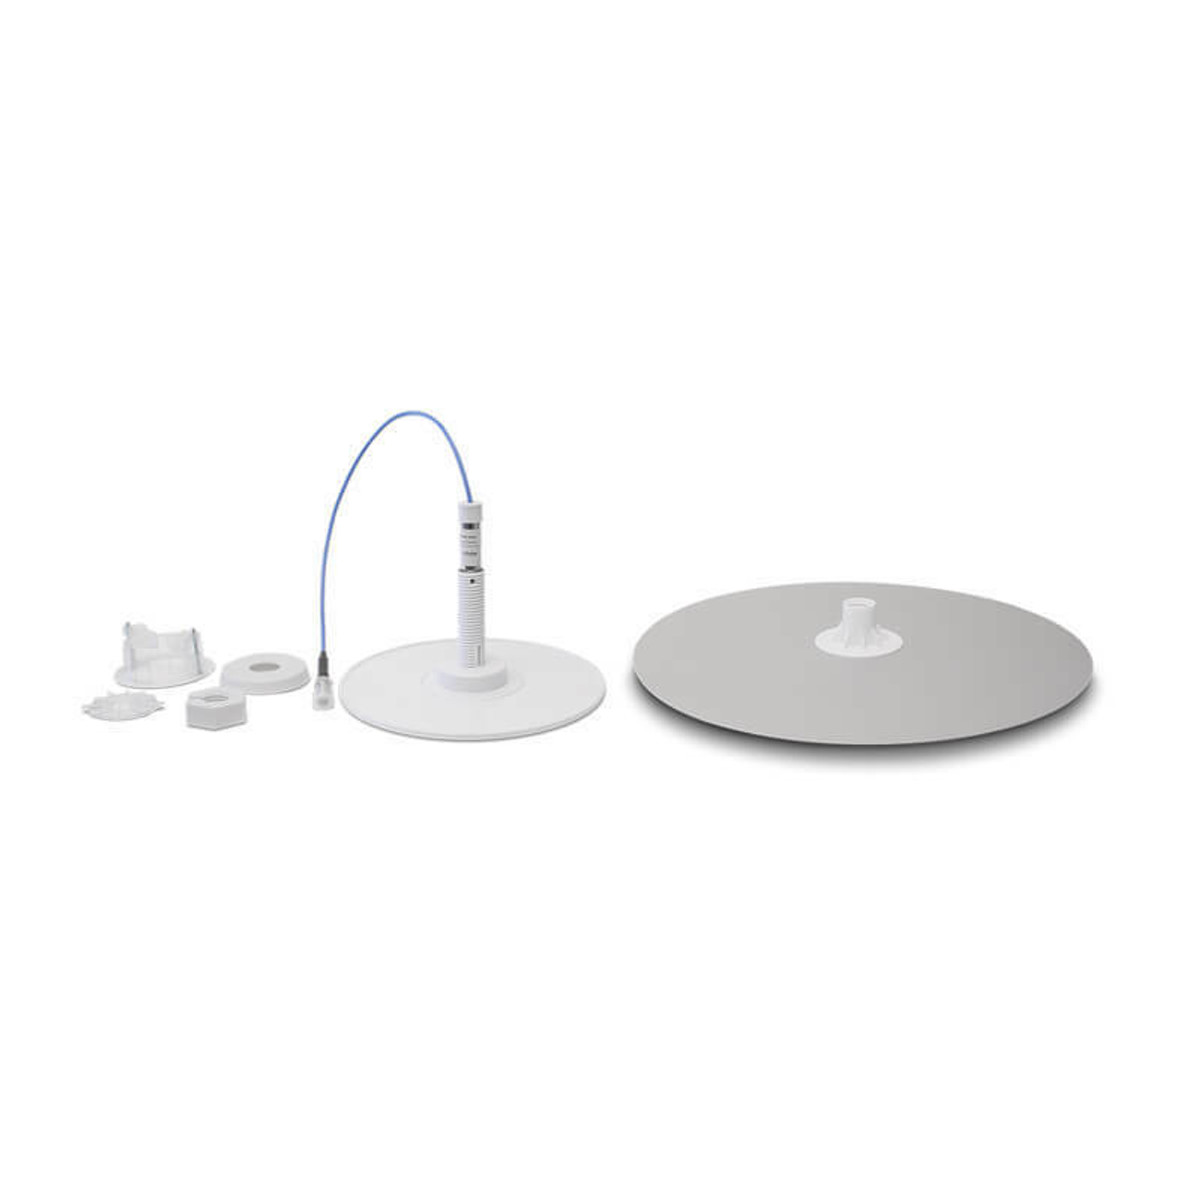 Techwave Wilson 4G Low-Profile Dome Antenna w/Reflector, 50 Ohm - 314406